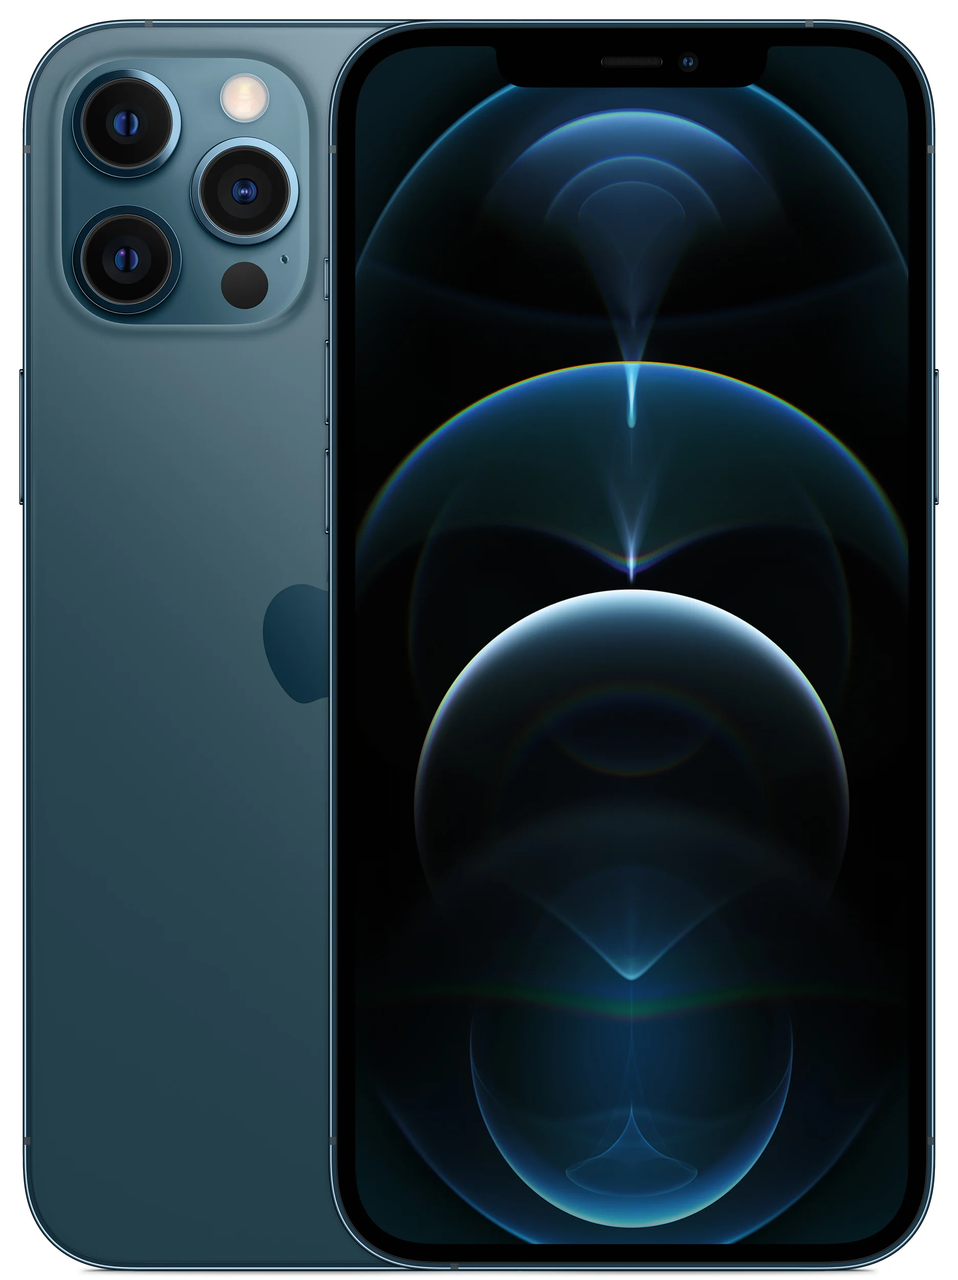 Смартфон Apple iPhone 12 Pro Max 256GB Dual Sim Pacific Blue (MGС73)